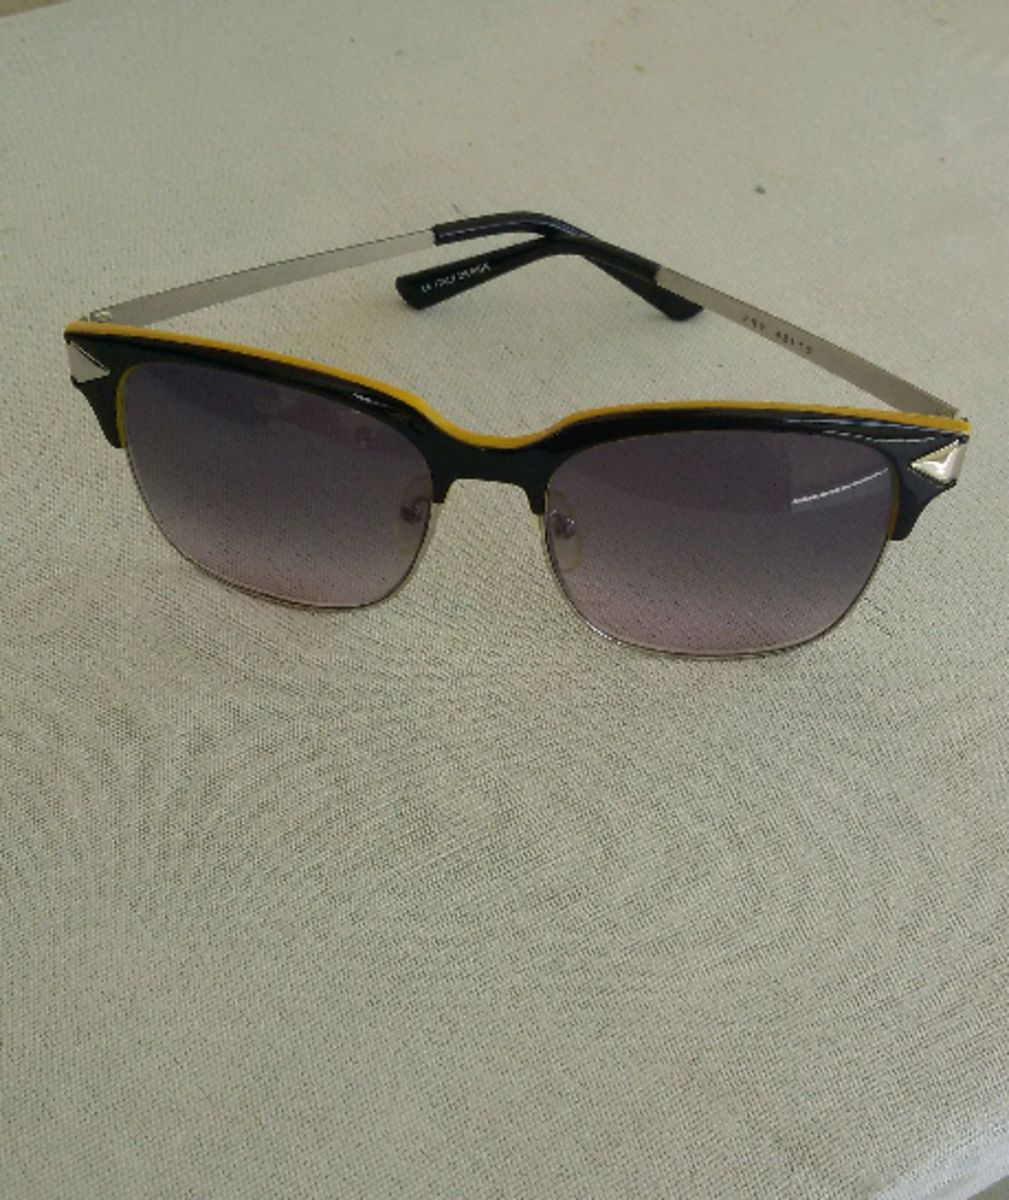 2c9148a4ab697 óculos ferrovia - óculos ferrovia.  Czm6ly9wag90b3muzw5qb2vplmnvbs5ici9wcm9kdwn0cy8ymdc2mdcvmddhytllmge3ztjkymq2nzriowjiymjlmgvizdfiyzauanbn  ...